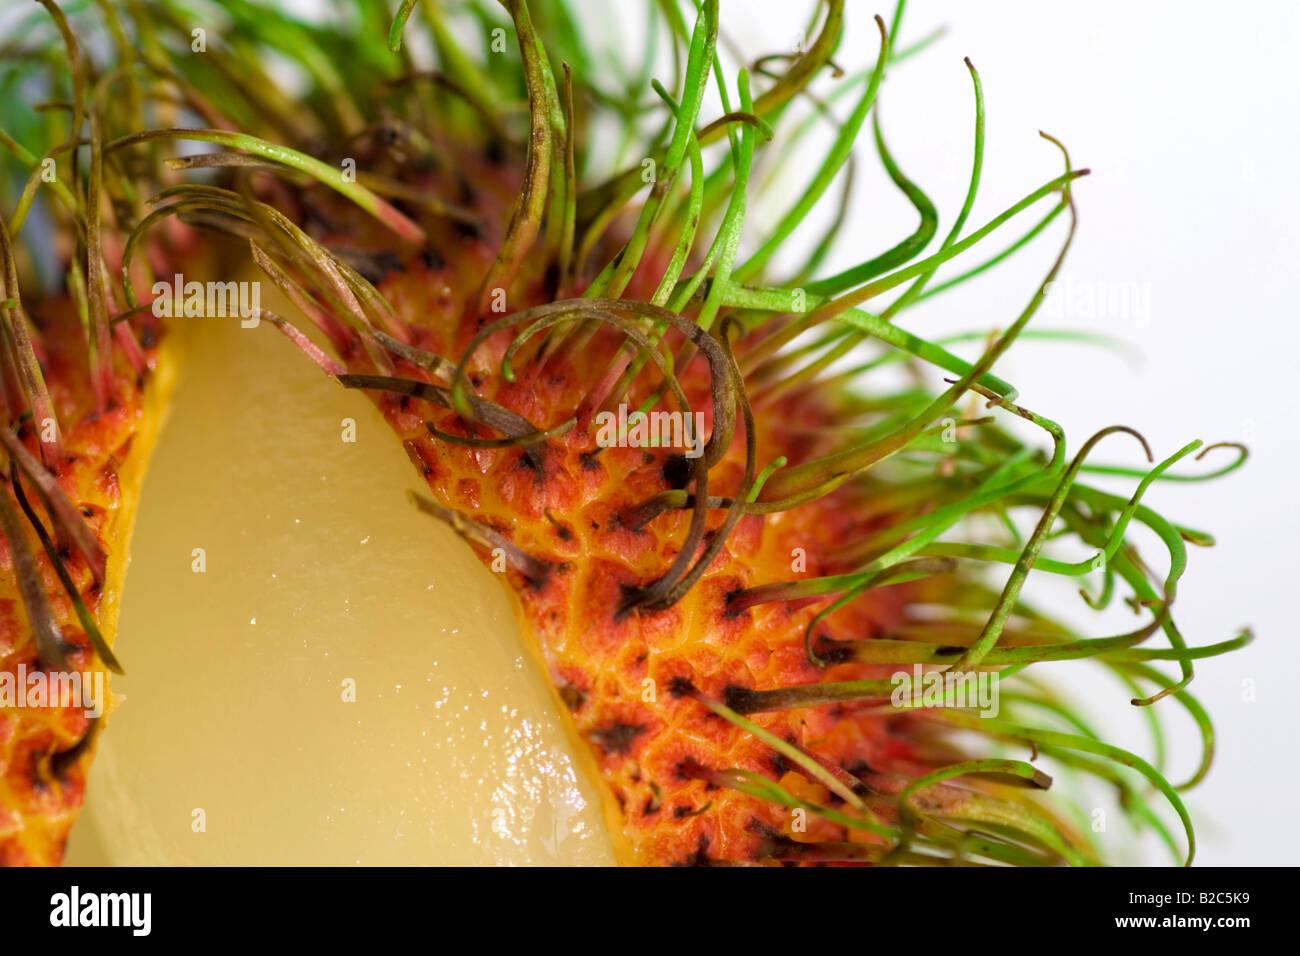 Rambutan (Nephelium lappaceum), macro image of tropical fruit - Stock Image